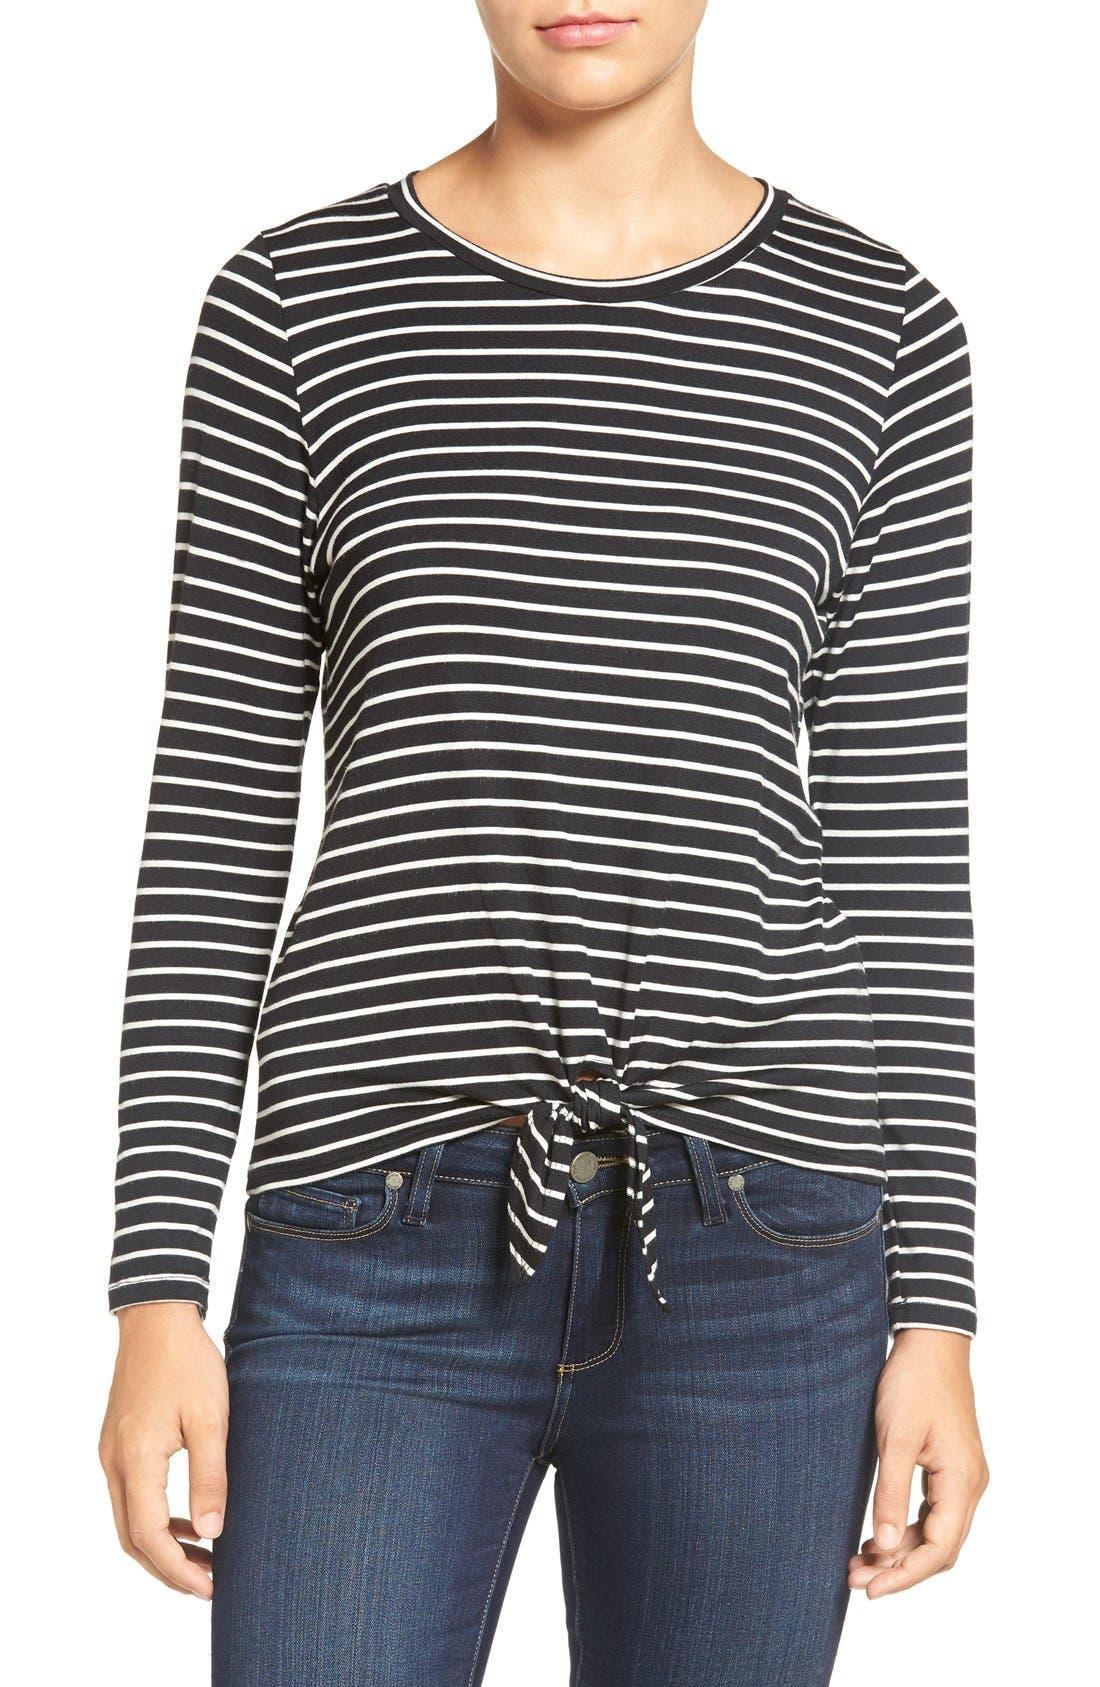 AMOUR VERT 'Melinda' Stripe Tie Hem Top, Main, color, AMSTERDAM STRIPE